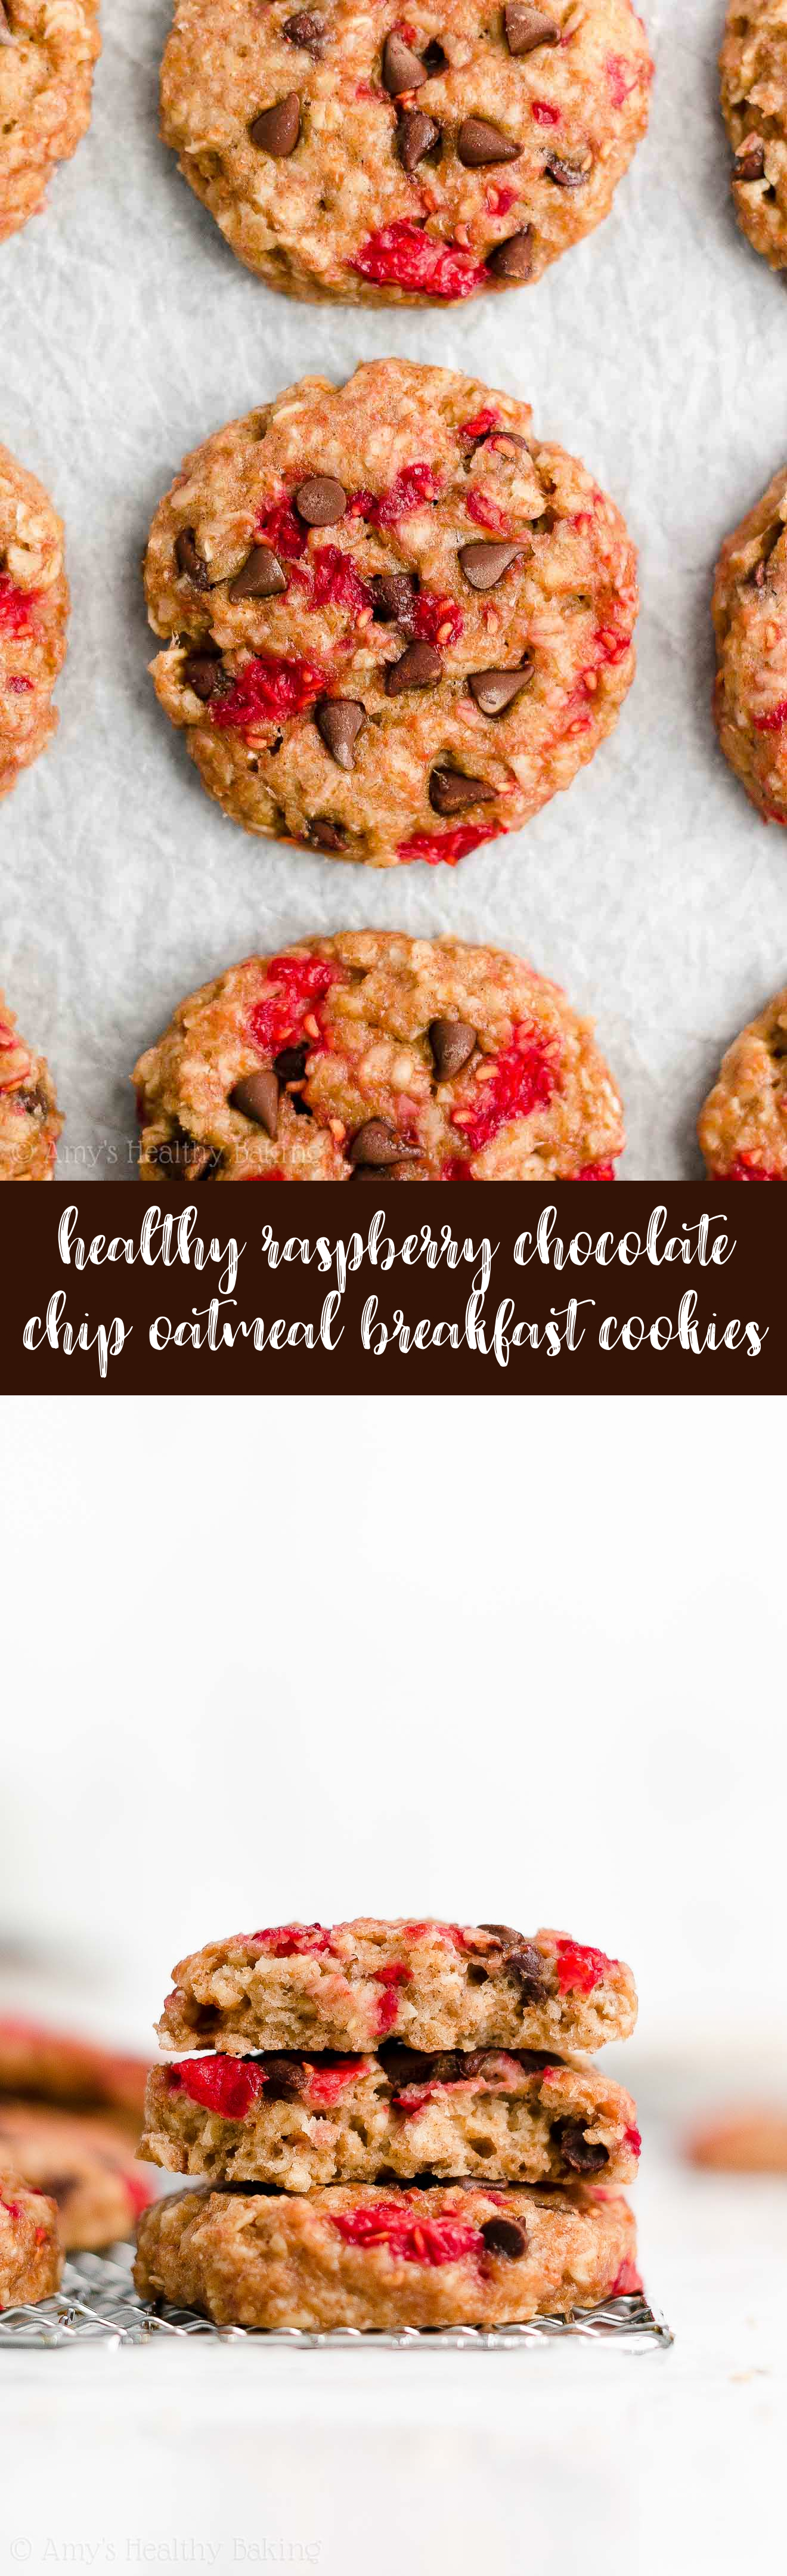 Best Easy Healthy Low Calorie Gluten Free Raspberry Chocolate Chip Oatmeal Breakfast Cookies